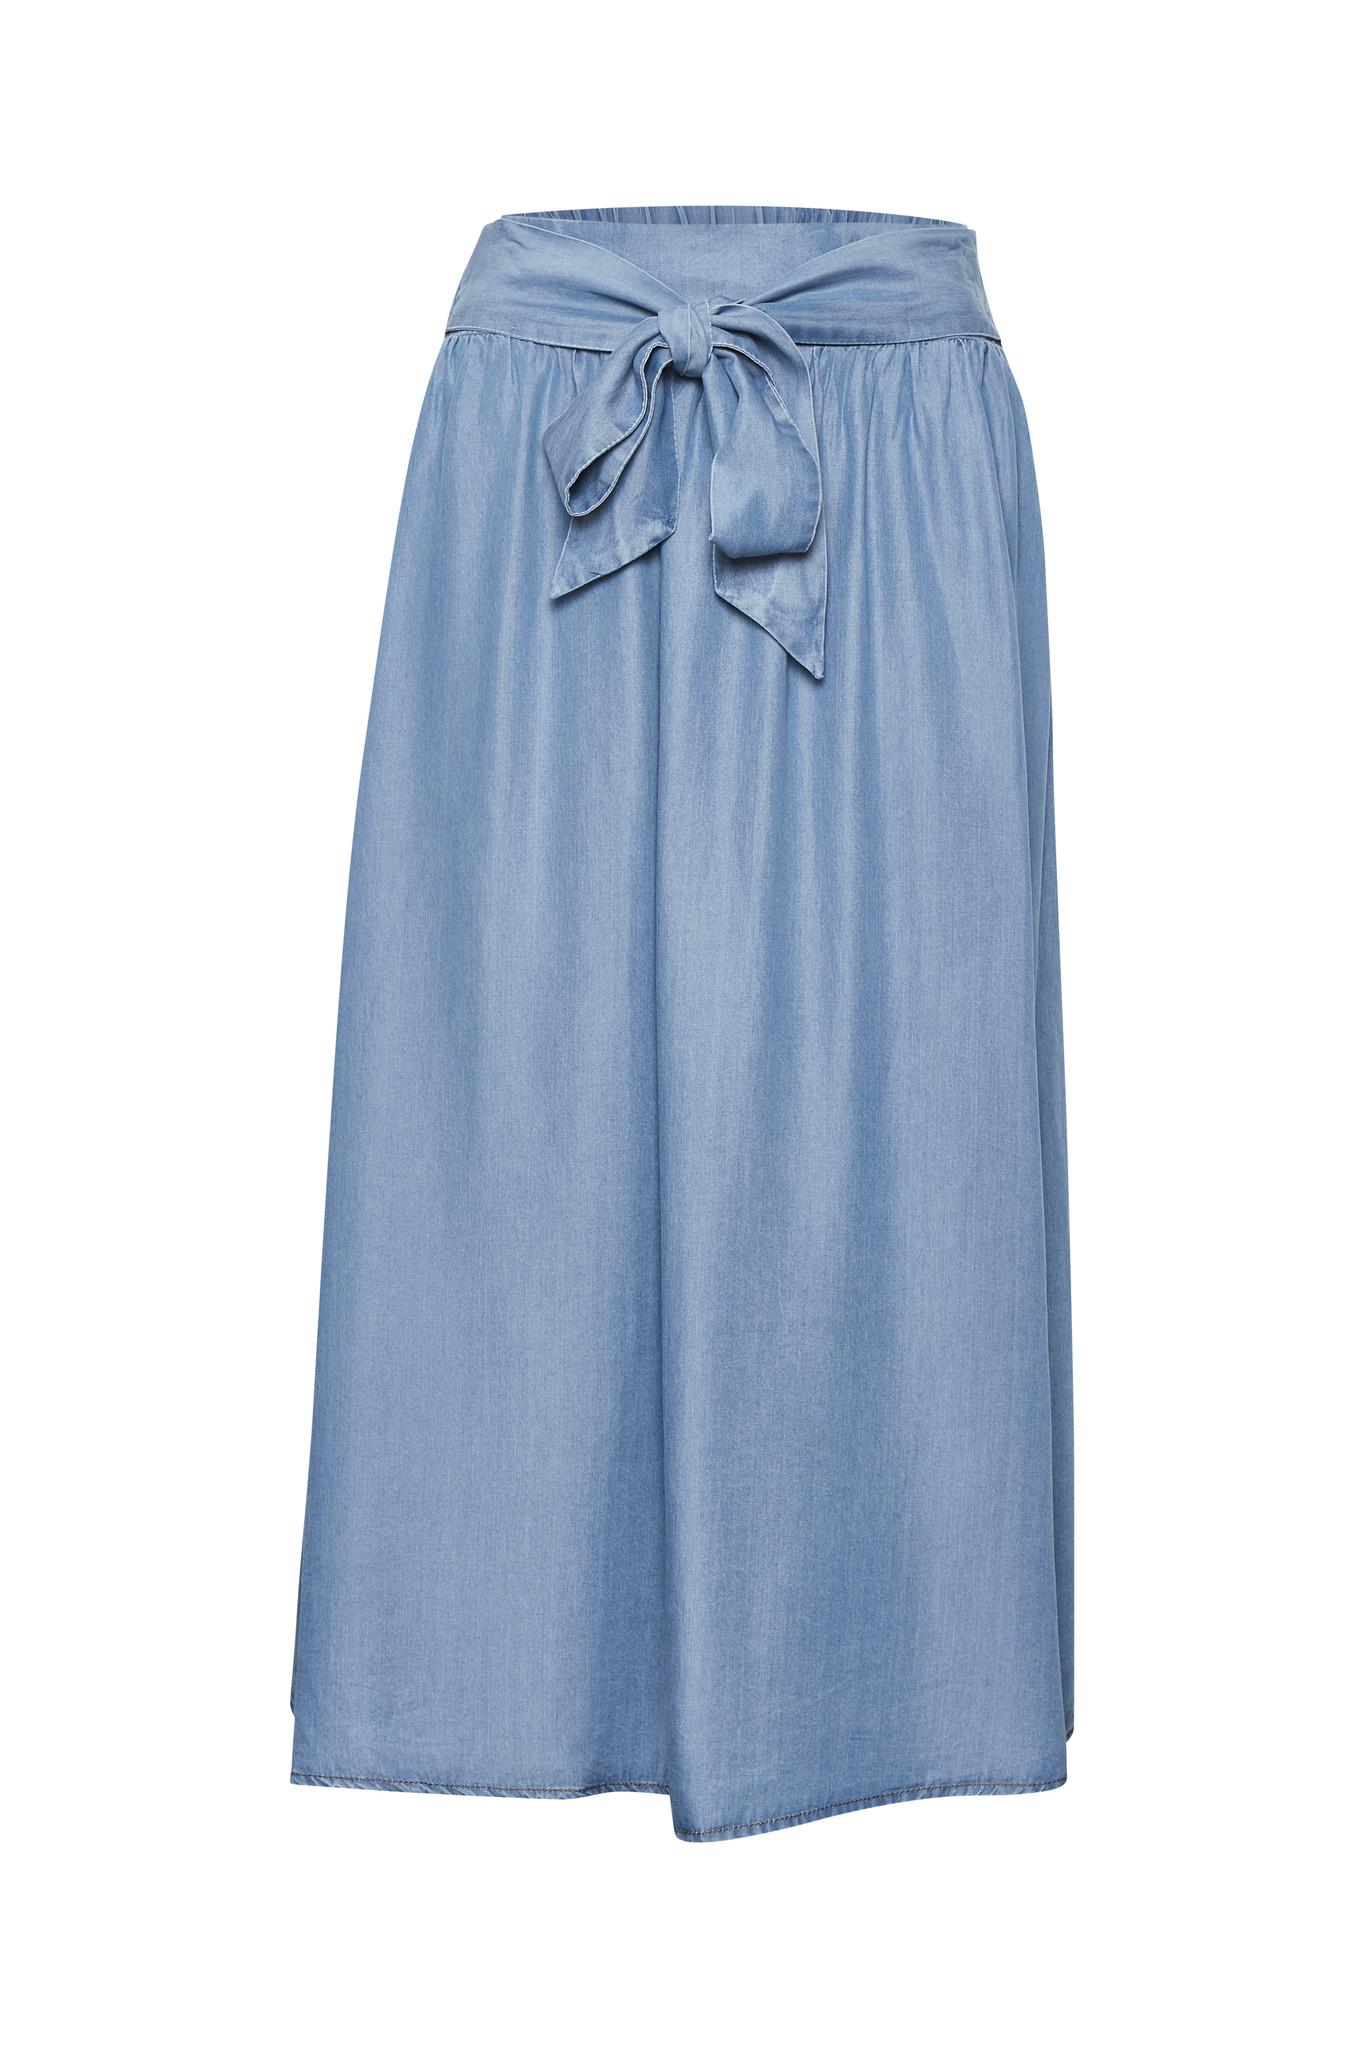 Rok EsterCR Skirt Denim Blue-1